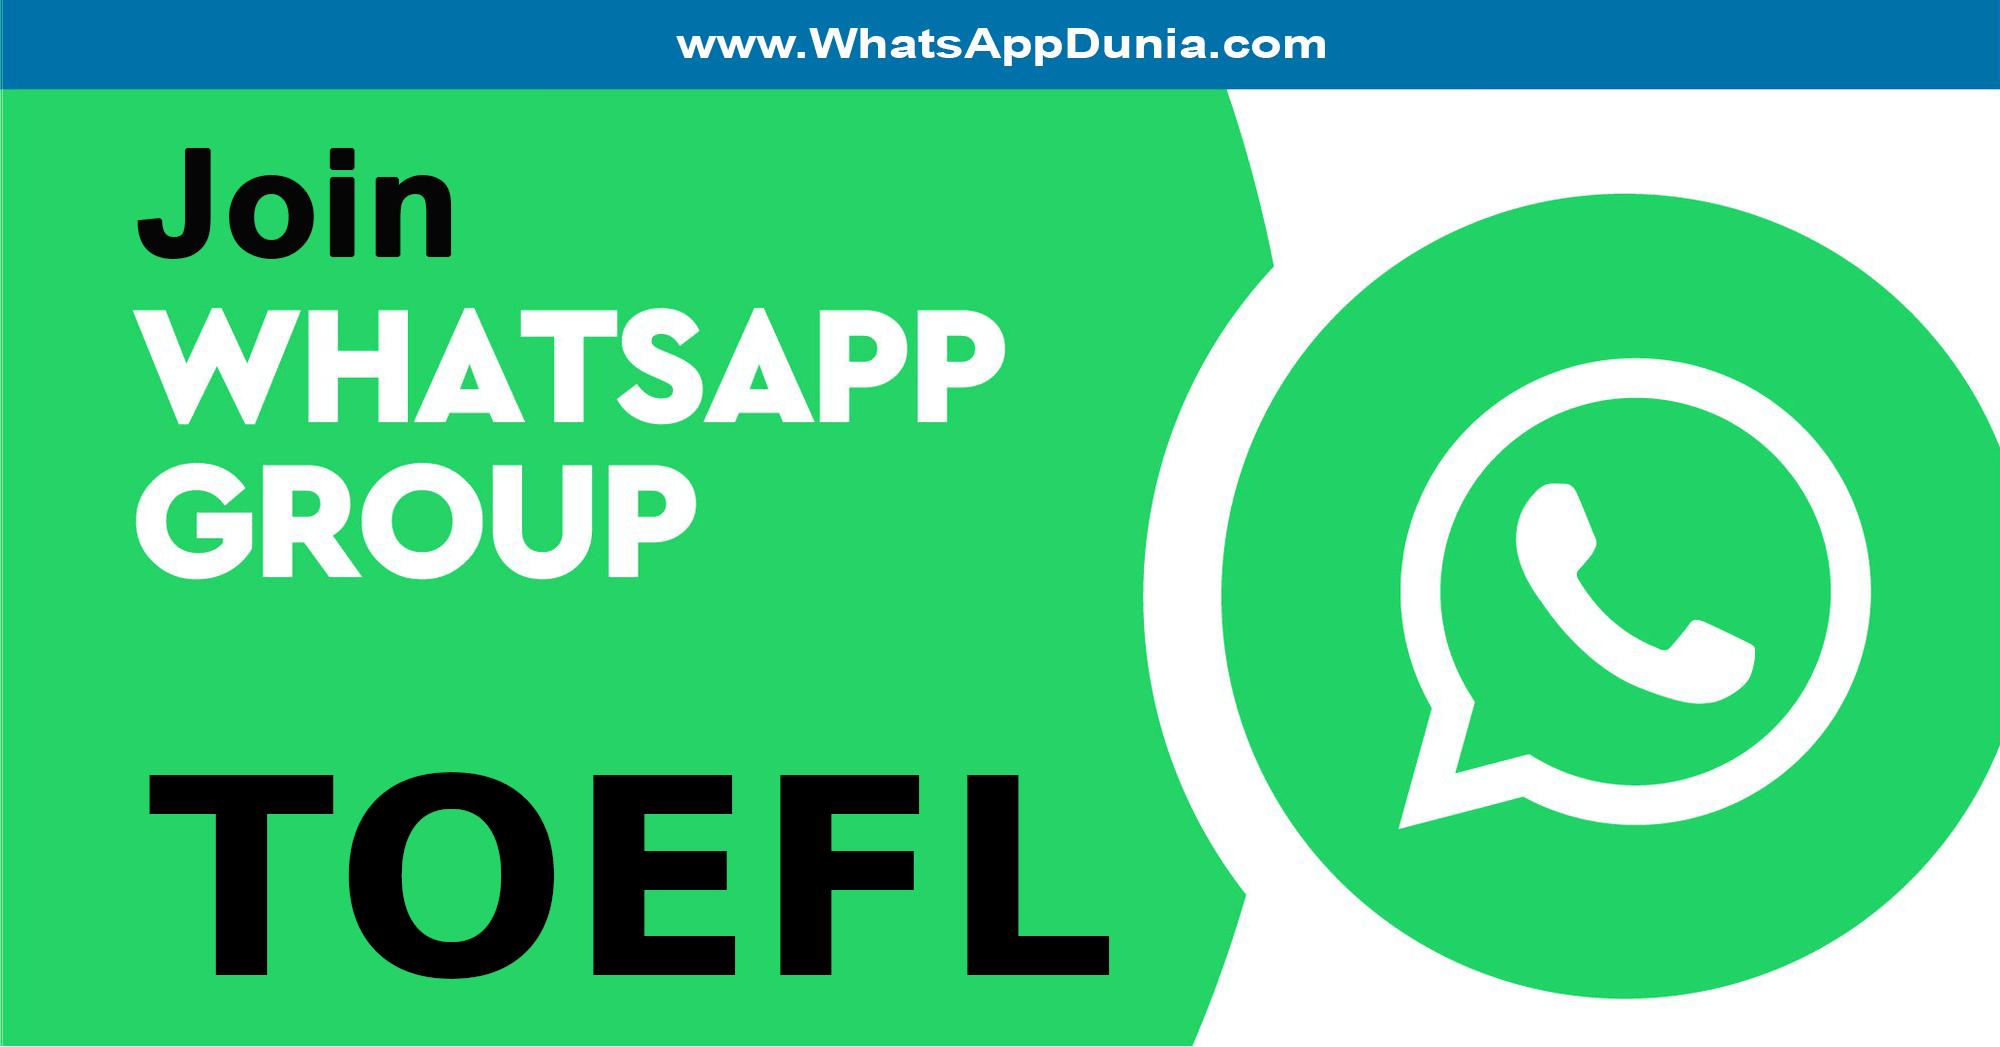 TOEFL WhatsApp Group Links